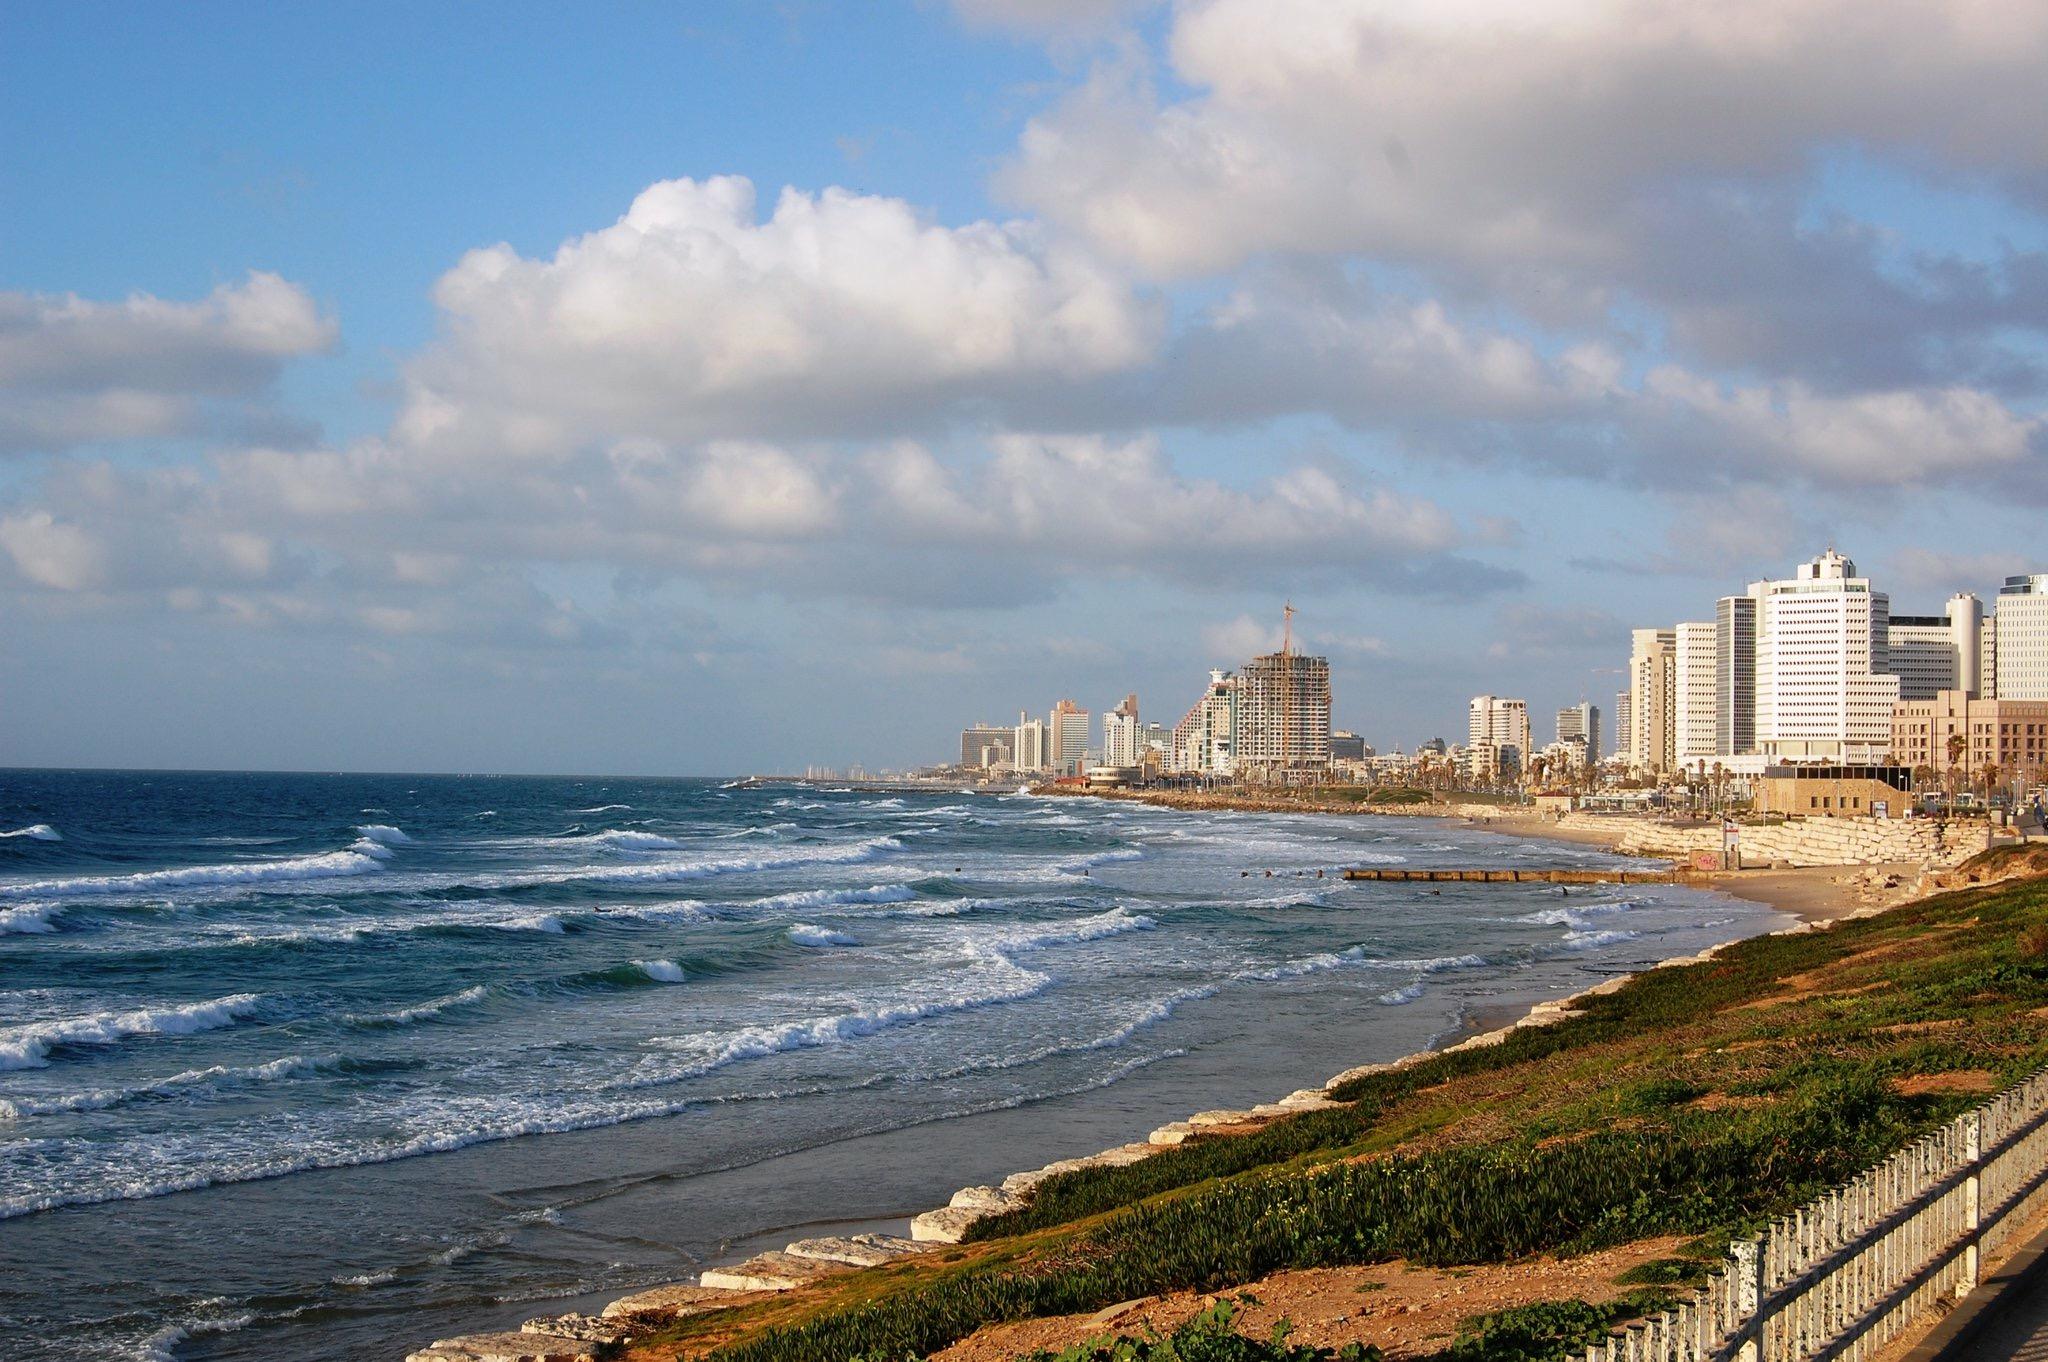 Tel Aviv at its Best